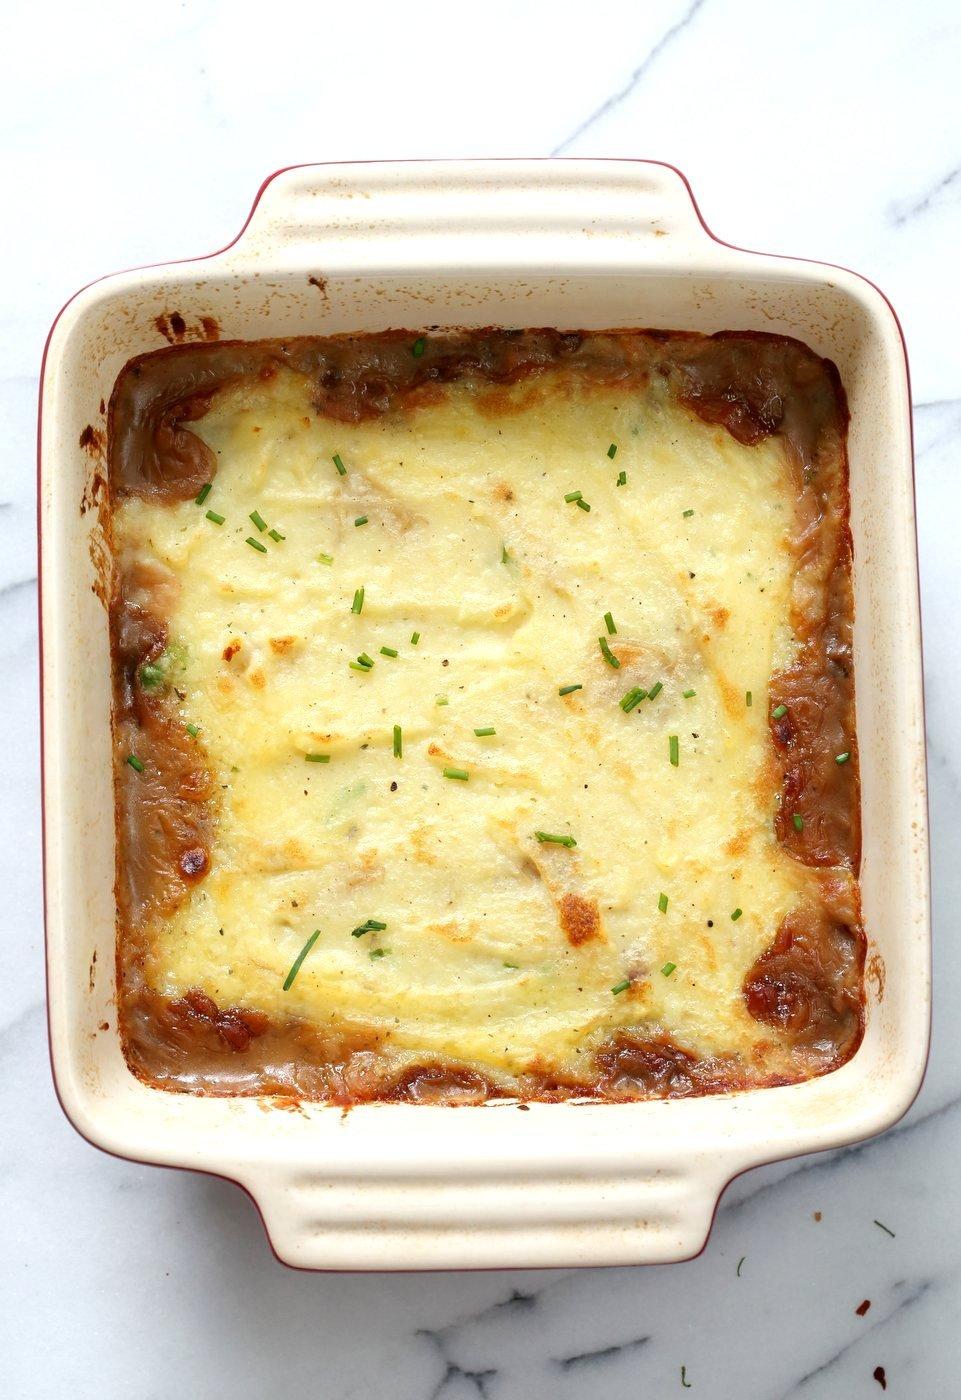 Vegan Shepherd's Pie - Mushroom and Lentil Shepherdless Pie with Gravy and Garlic mashed potatoes. #Vegan #Glutenfree #Recipe. Can be soy-free.#veganricha | VeganRicha.com